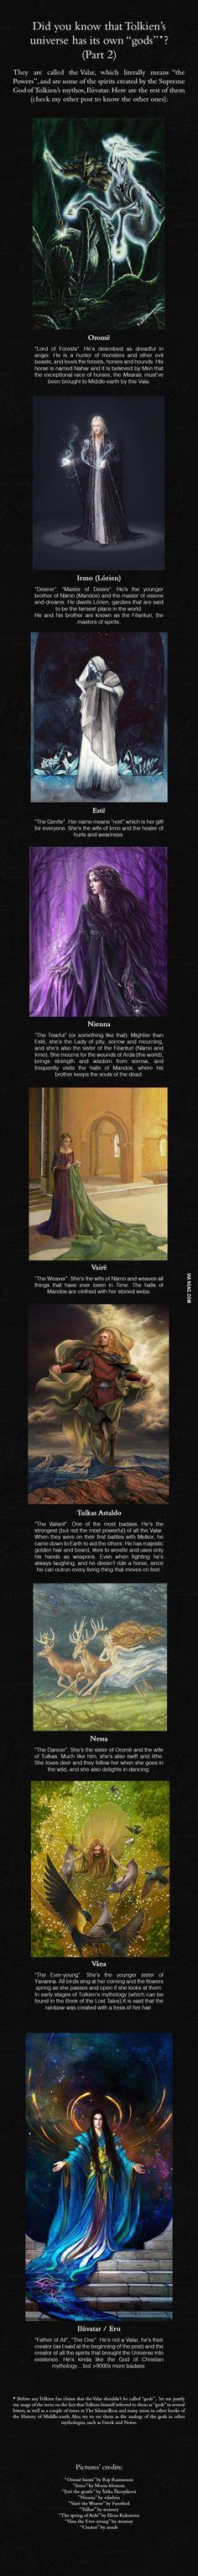 The Valar, part 2 - J.R.R. Tolkien's Mythology